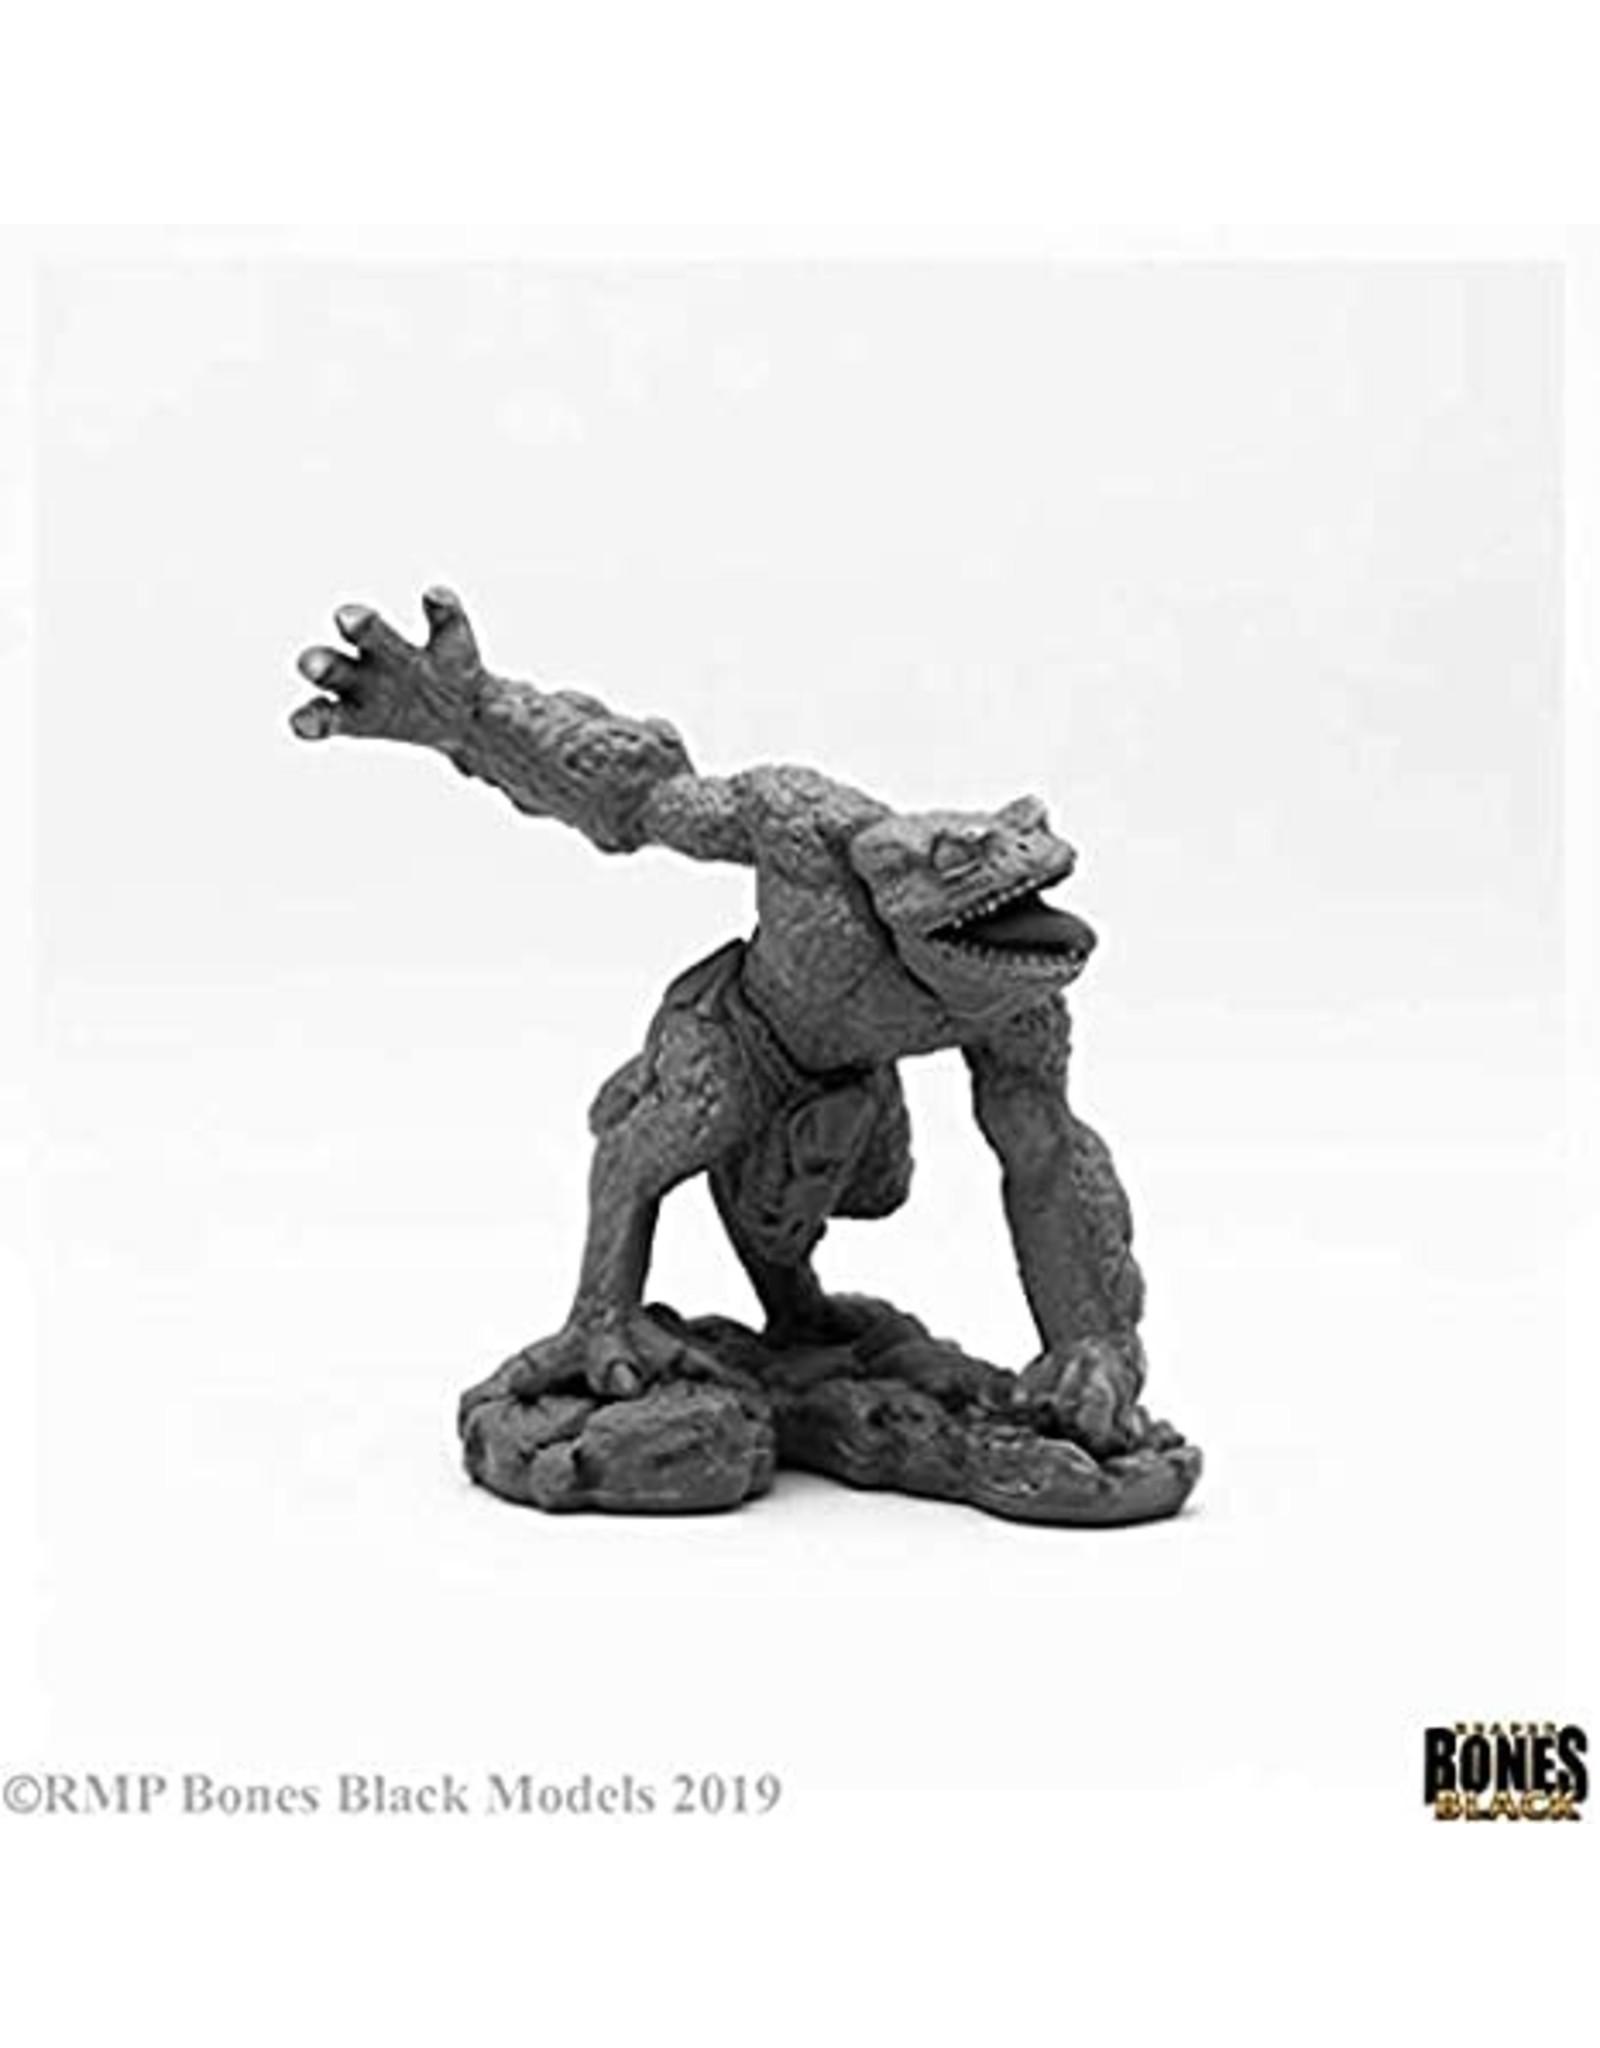 Reaper Bones Black: Chaos Toad Savage